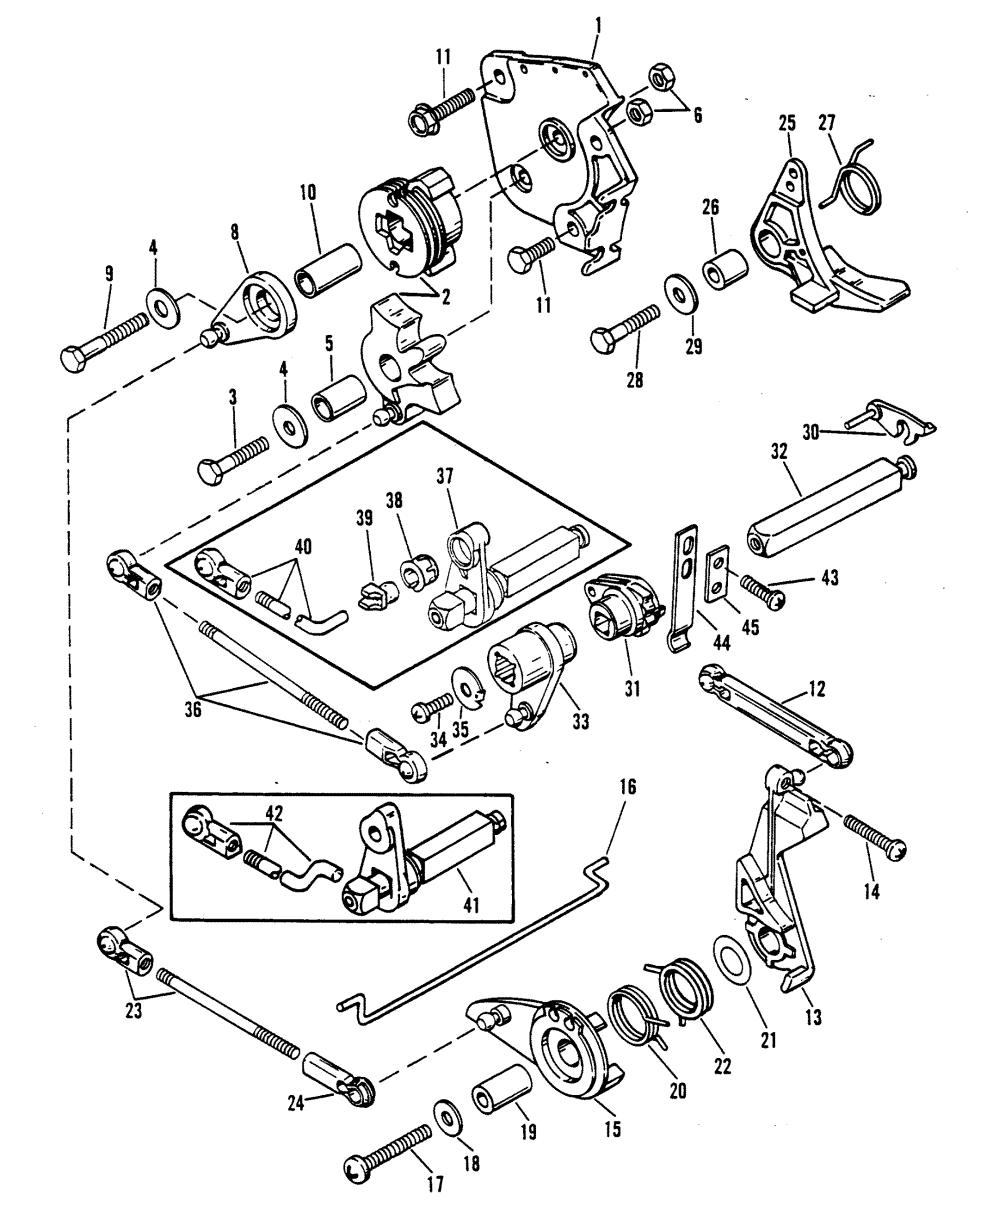 medium resolution of 2013 150 hp etec wiring diagram 31 wiring diagram images 1978 johnson outboard wiring diagram mercury outboard motor diagrams